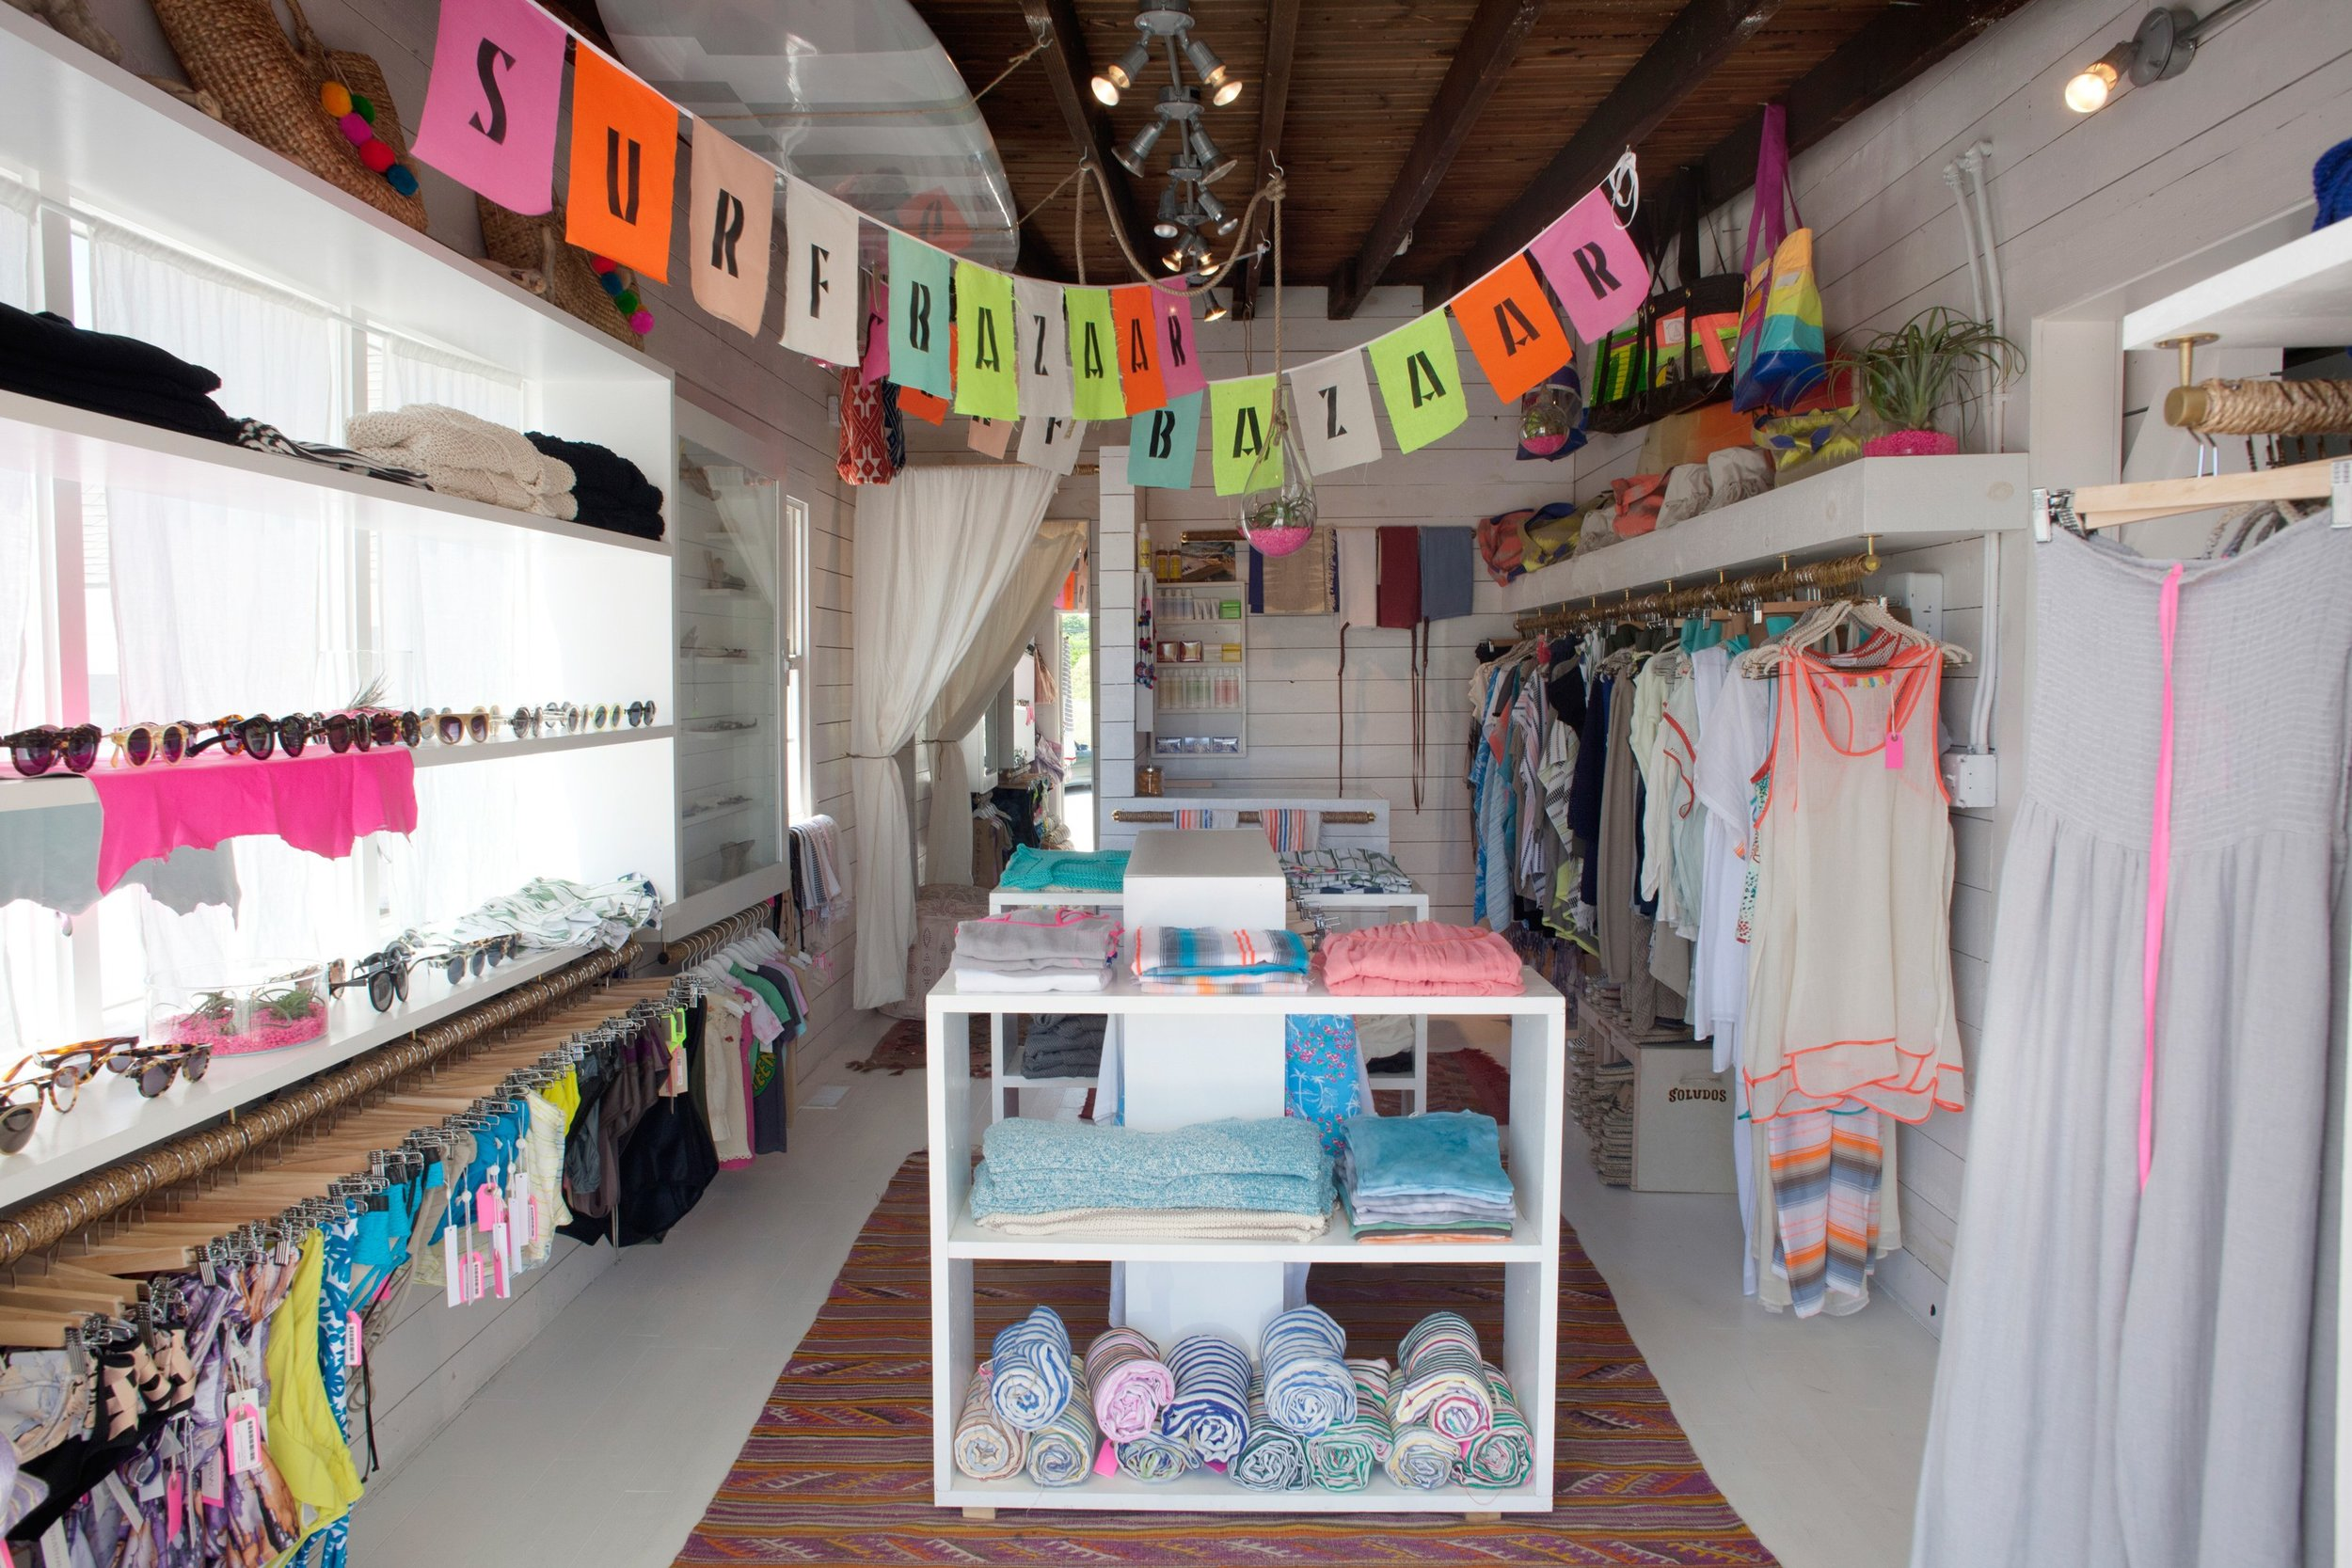 The Bazaar at Surf Lodge